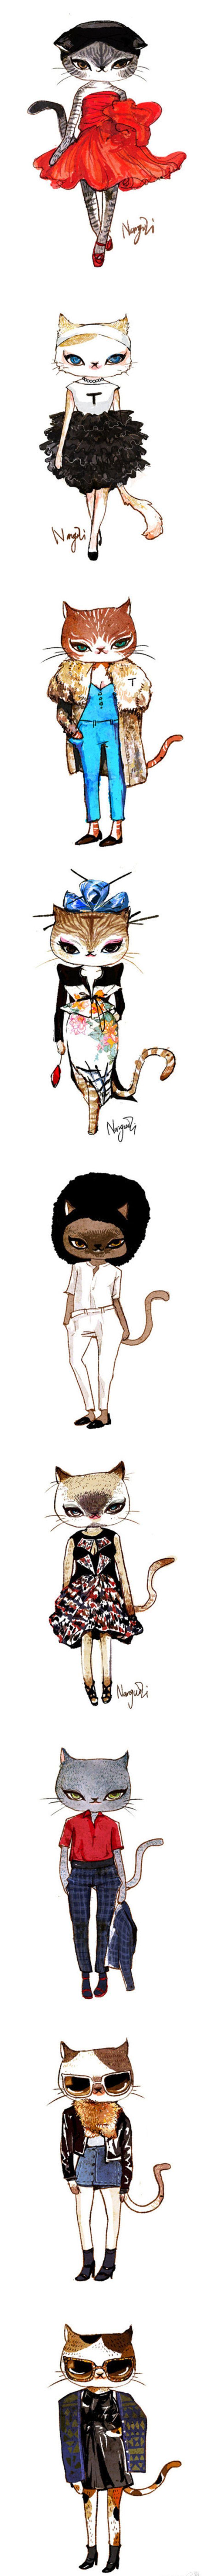 各种喵.各种秀。丨作者:Nargu li | translation reads as... Various meow. Variety show. Shu OF: Nargu li | via duitang ♥•♥•♥